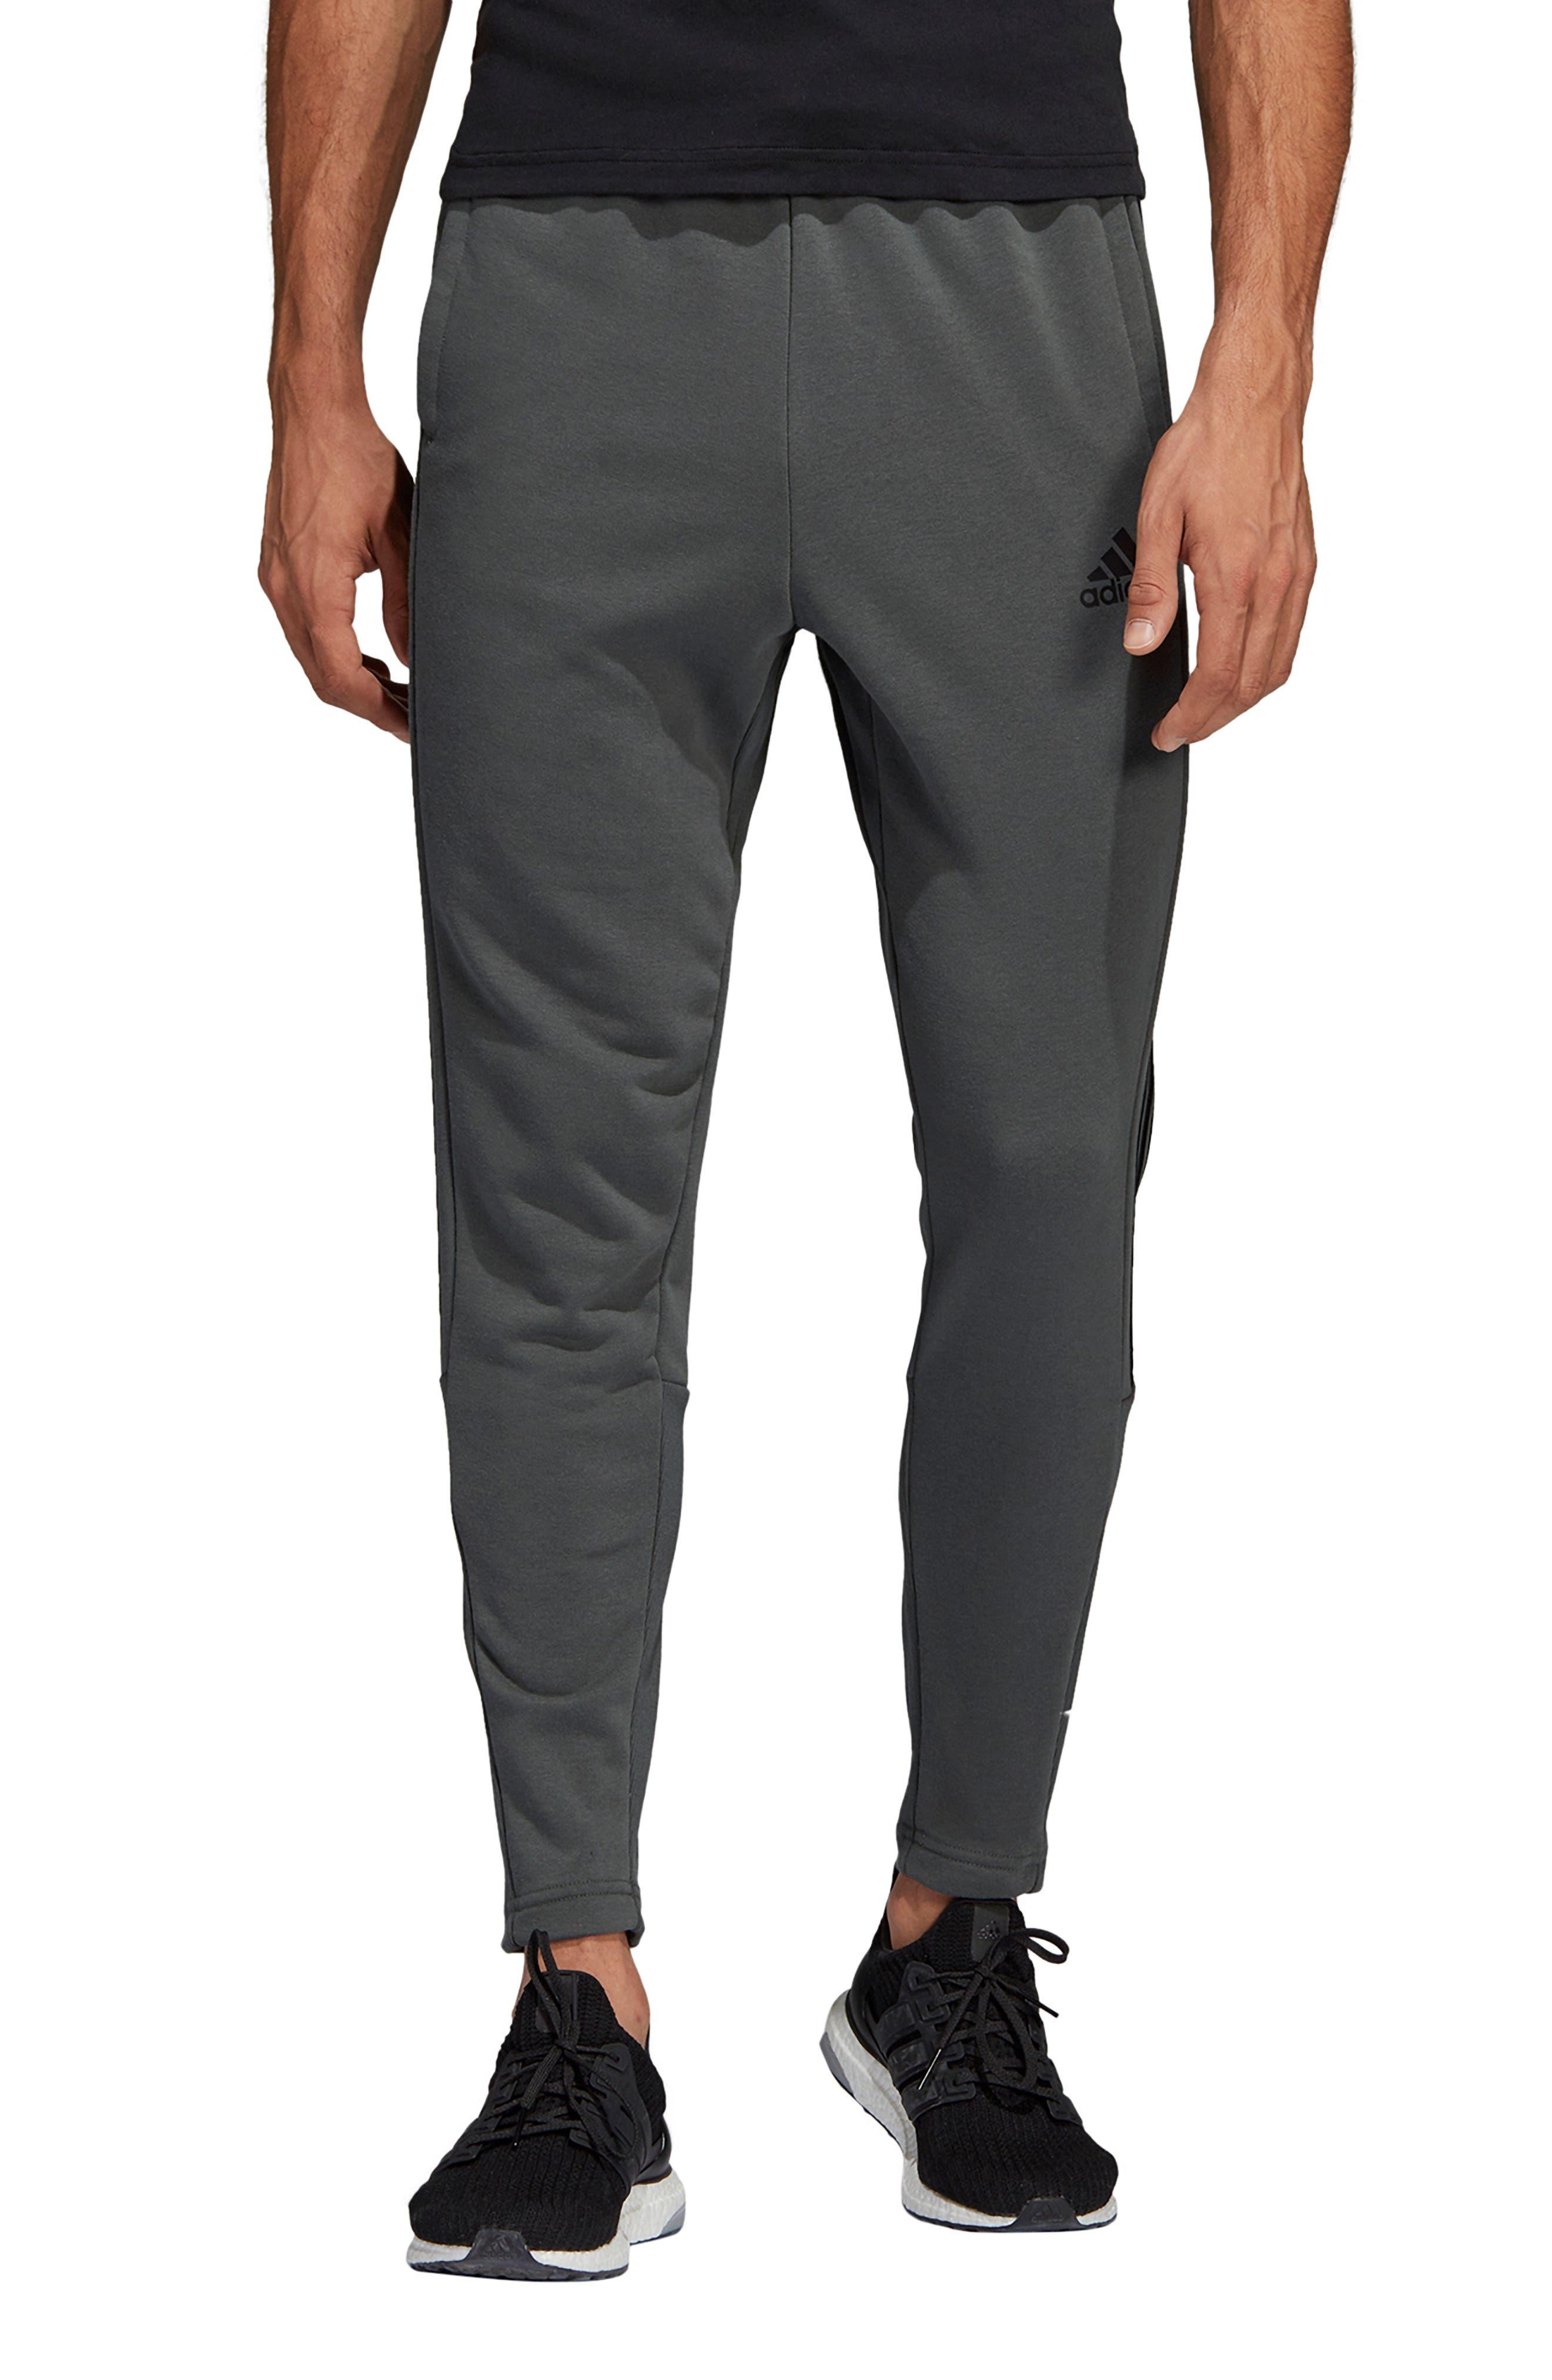 Men's Adidas Mh 3S Tiro Sweatpants